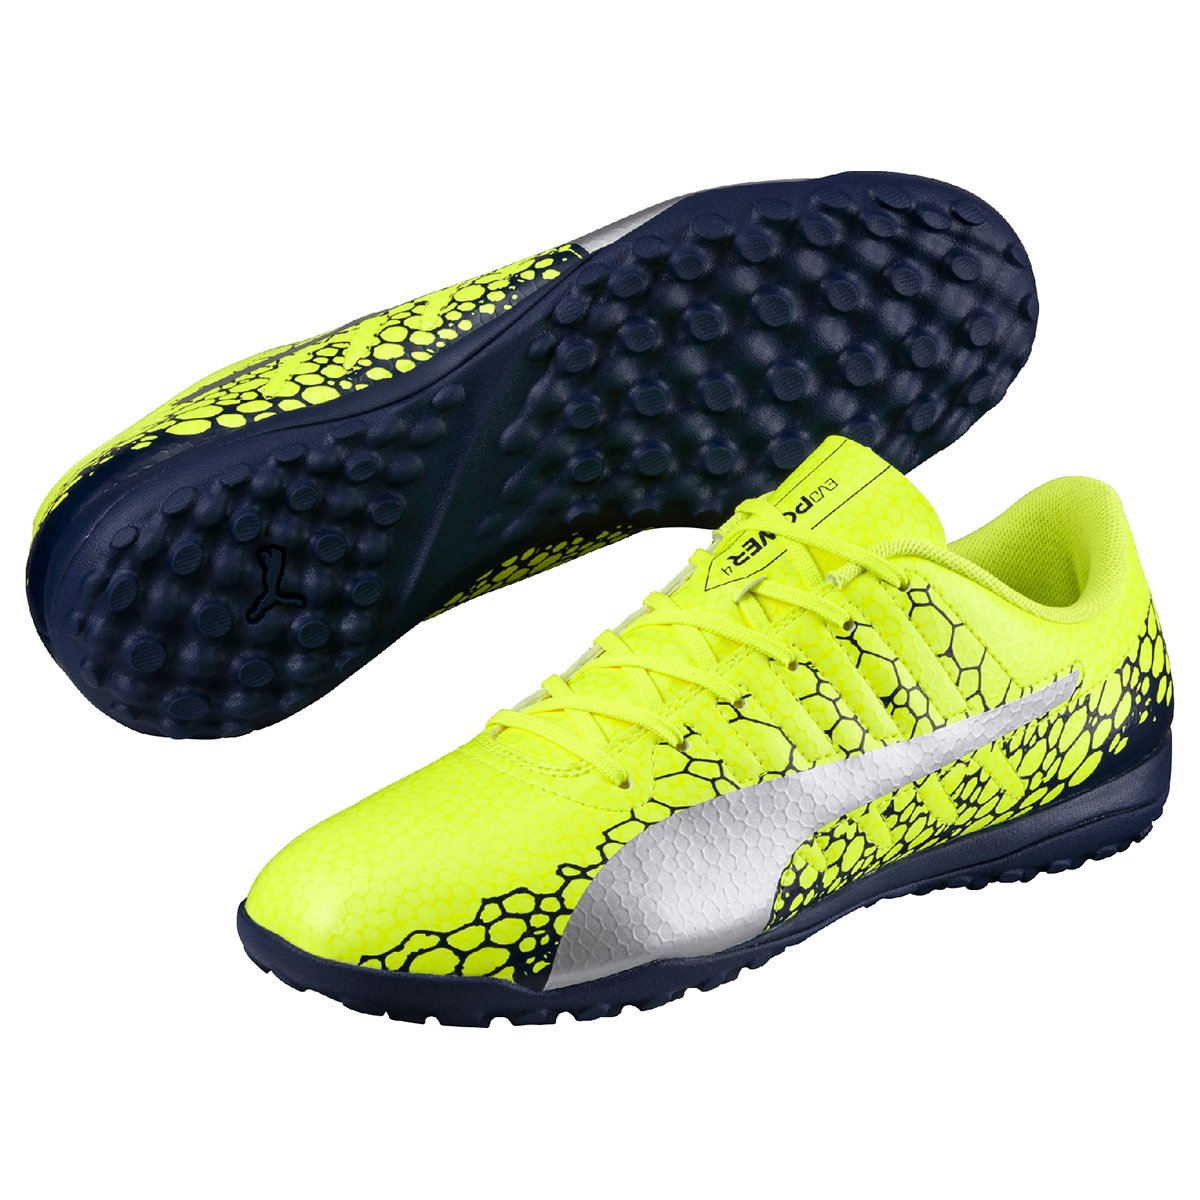 ... best cheap ca221 5fe7d Chuteira Society Puma Evopower Vigor 4 Graphic  TT Masculina  factory price 933be 667fc Chuteira Society Nike Tiempox  Ligera Iv Tf ... 2bb216e11c6a5